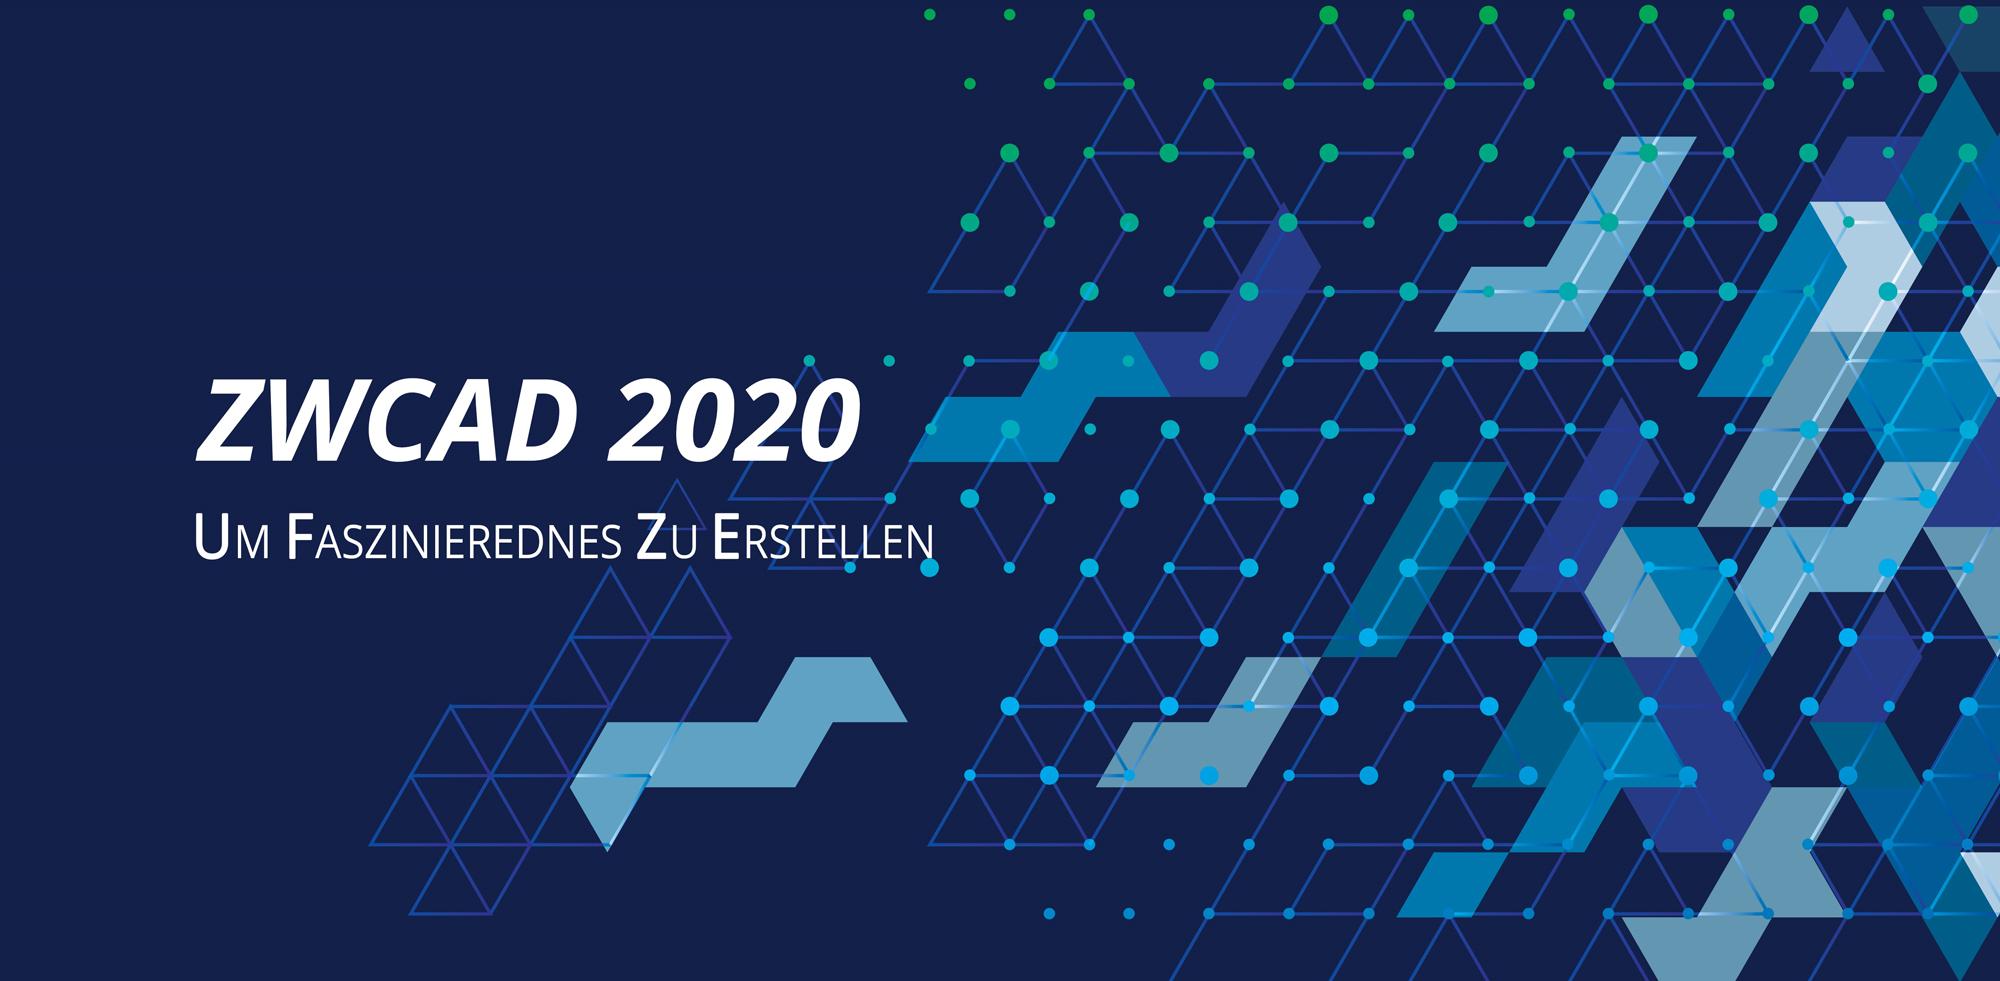 ZWCAD 2020 SP1 Jetzt verfügbar!